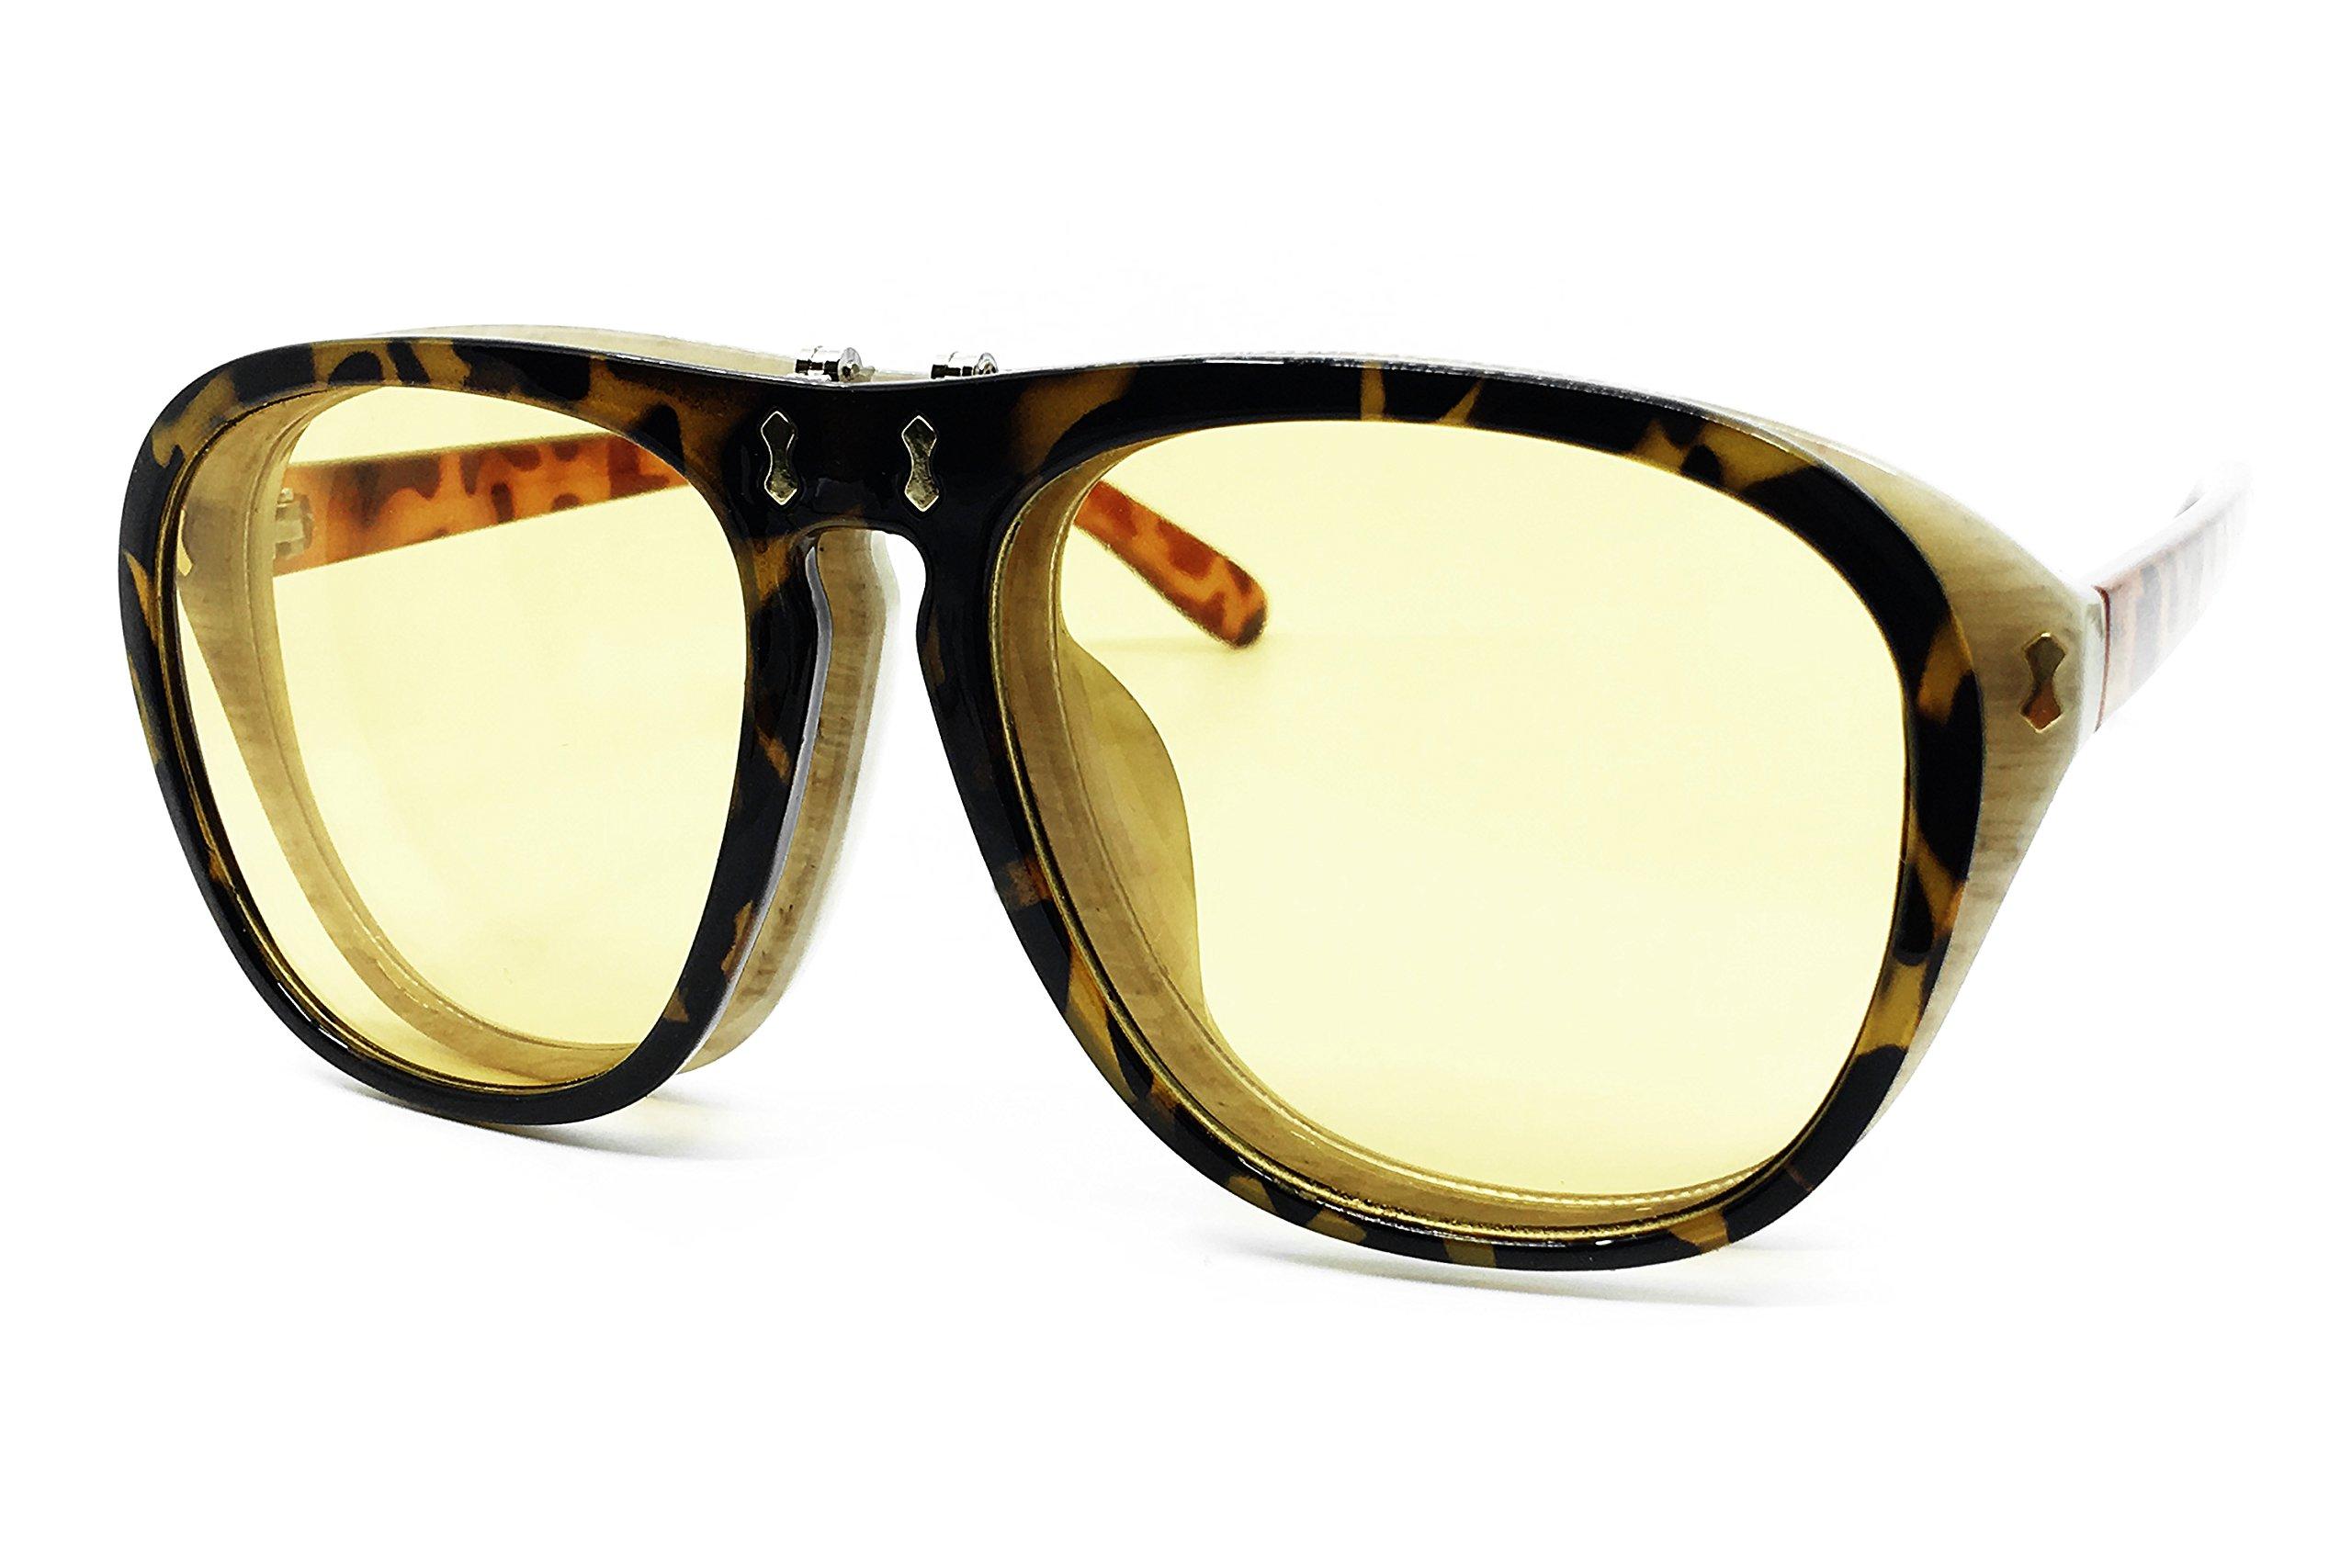 O2 Eyewear 8021 Premium Oversized XL Flip Up Steampunk Retro Vintage Brand Designer Style Sunglasses (YELLOW, 55)